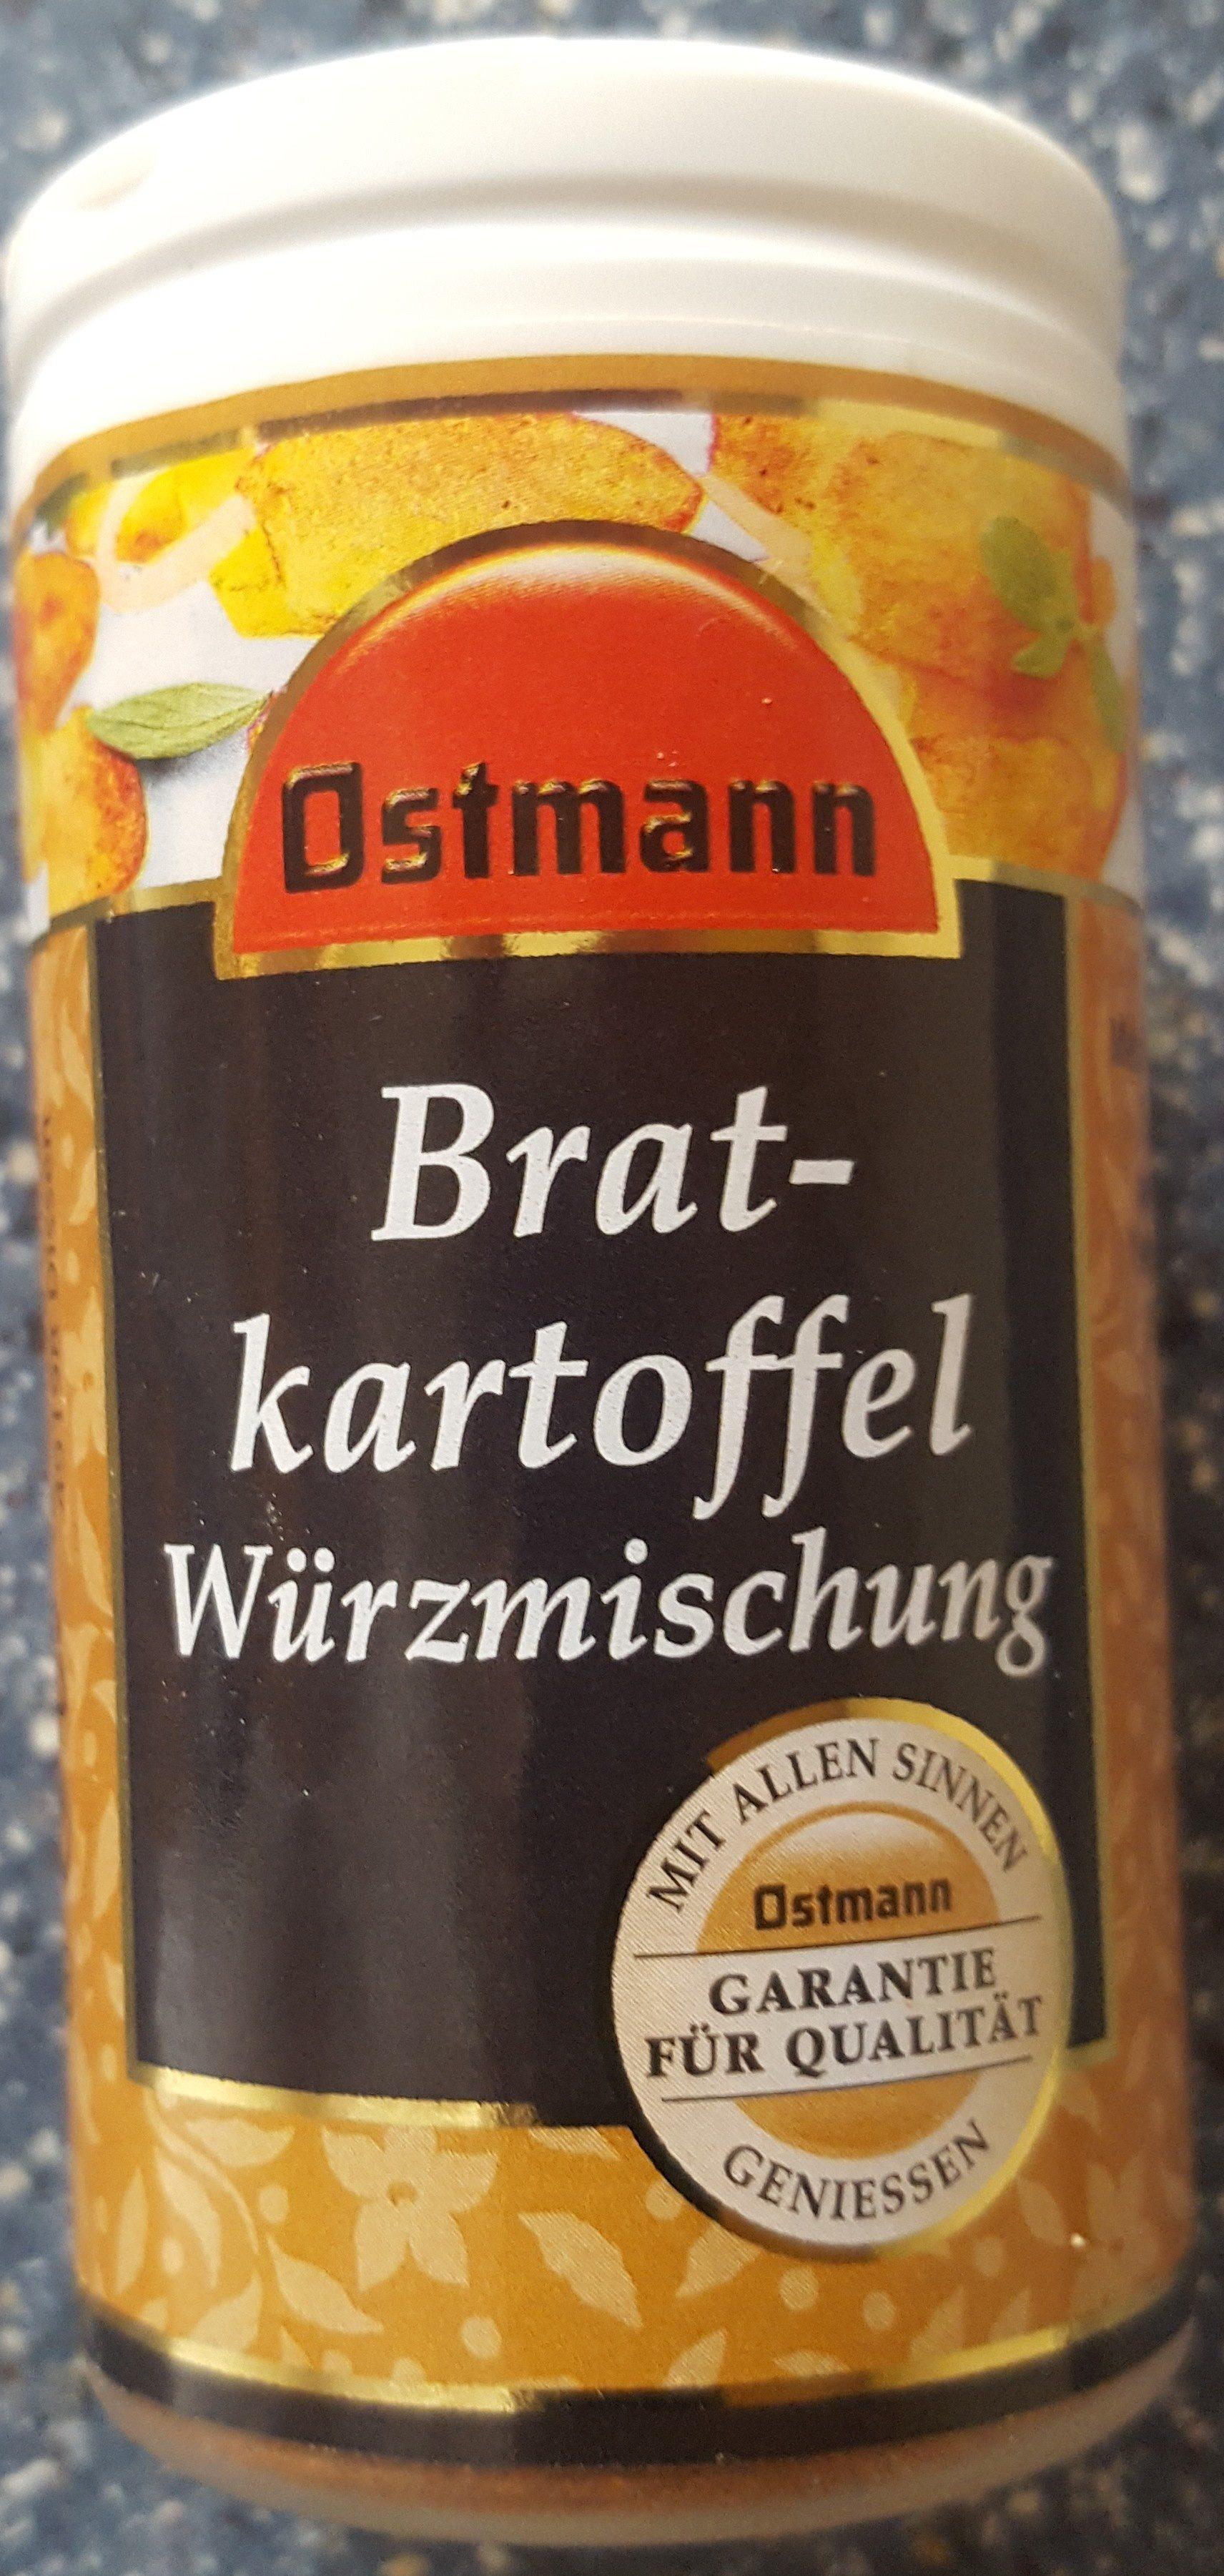 Bratkartoffel Würzmischung - Product - de